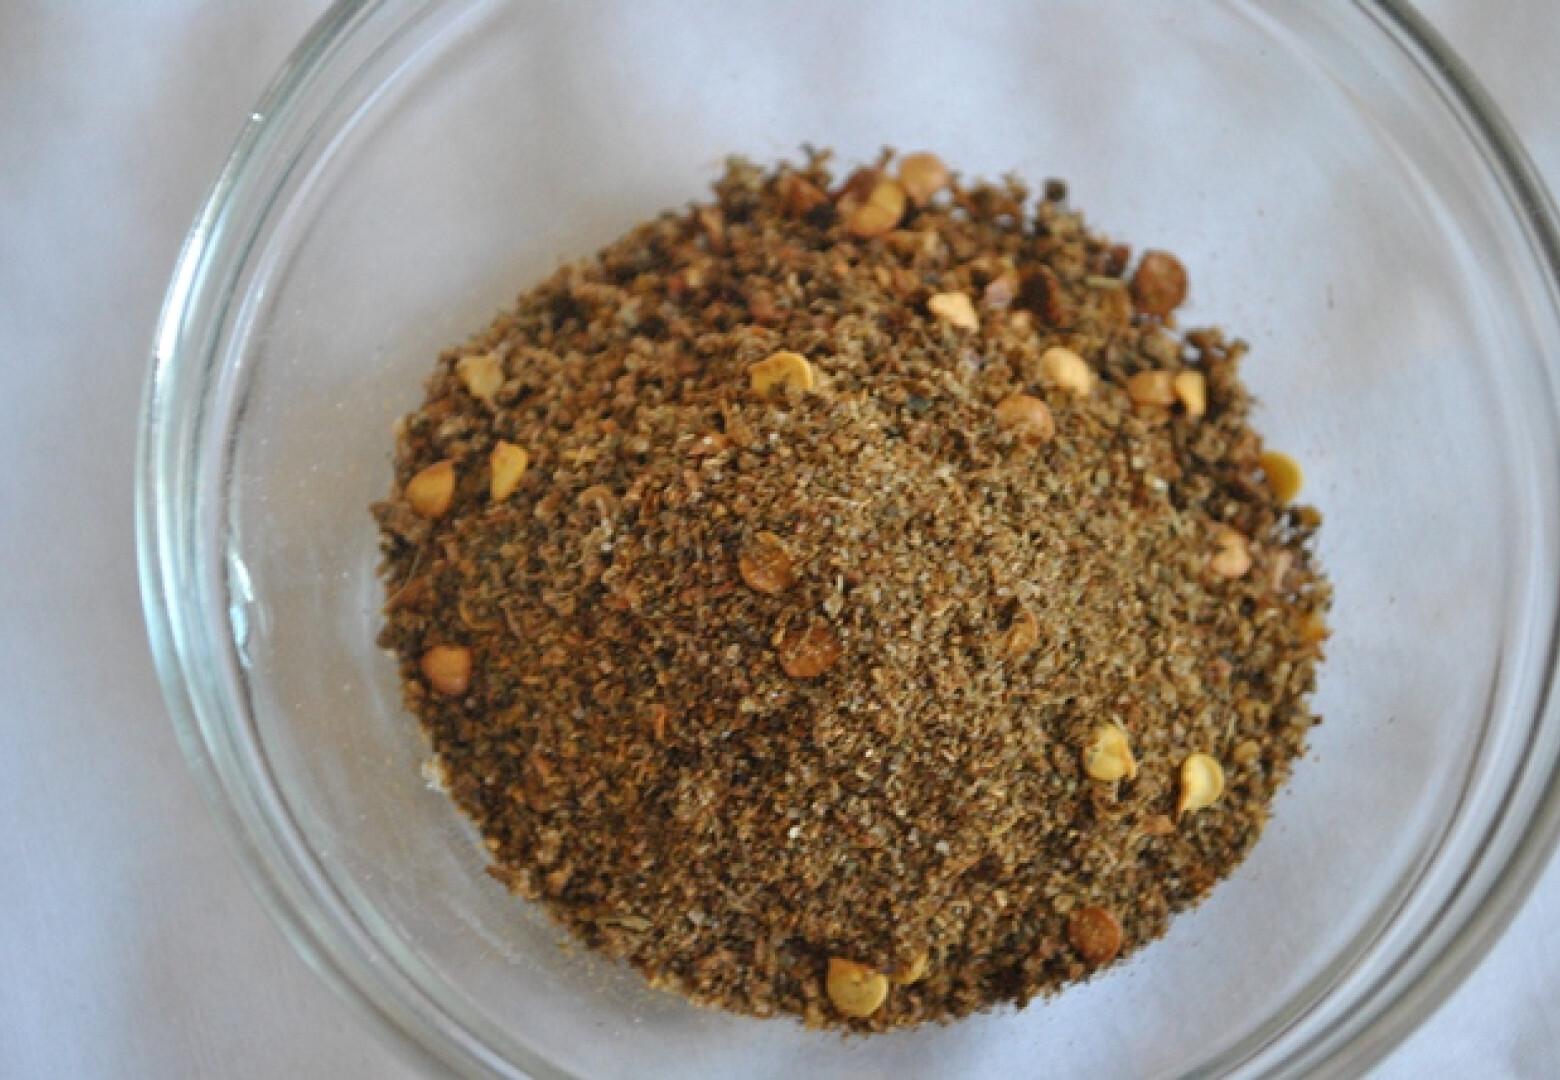 Puttanesca fűszerkeverék